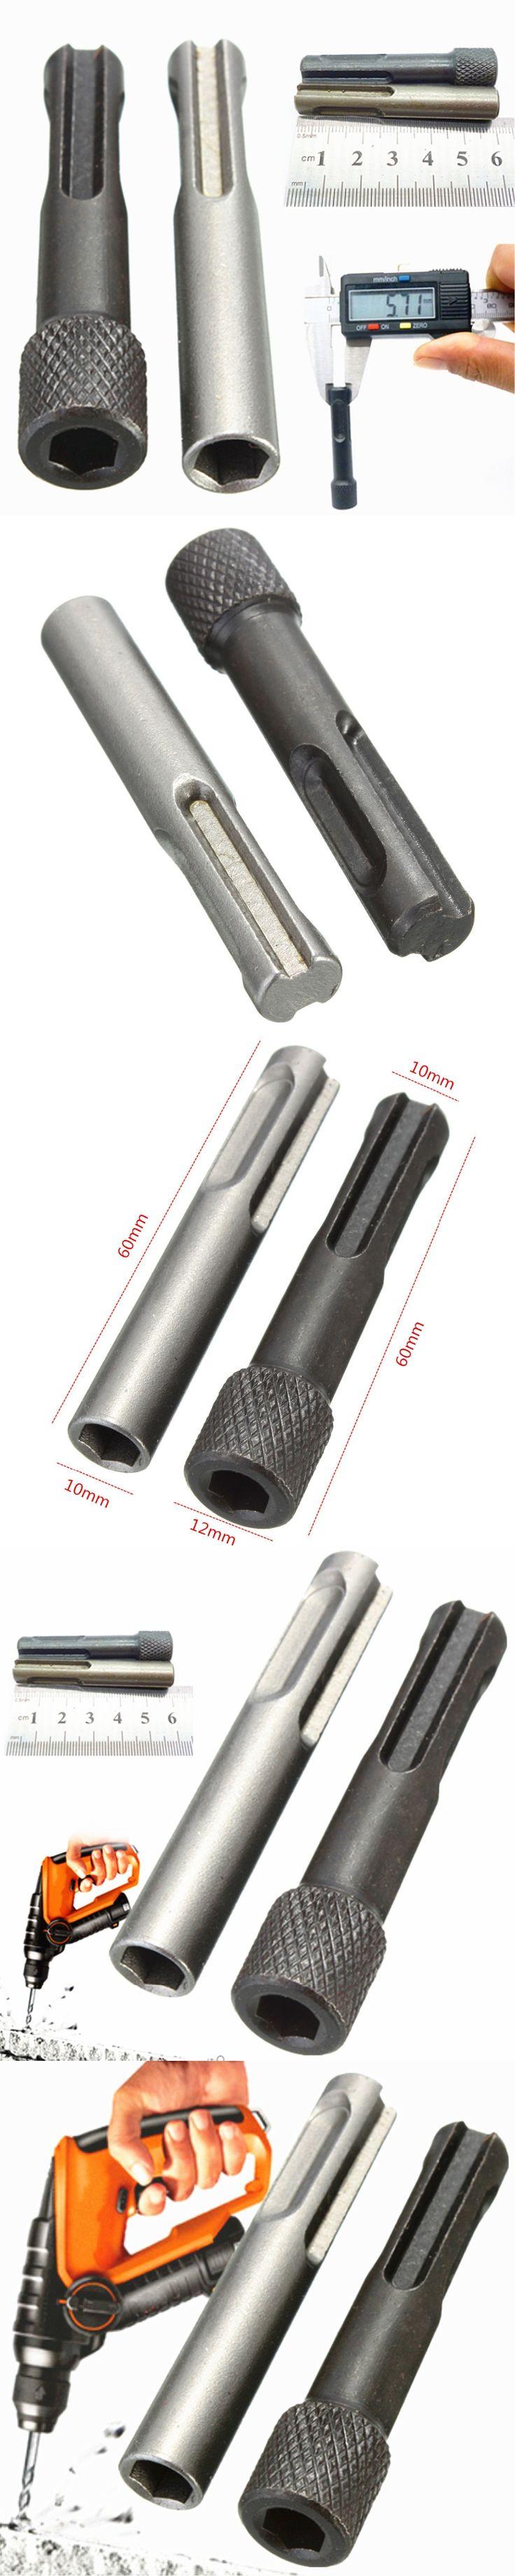 2PCS Hex Shank Screwdriver Holder Drill Bit Adaptor 1/4 Converter Socket Nut Impact Driver Set For for SDS Hammer Drilling Tool